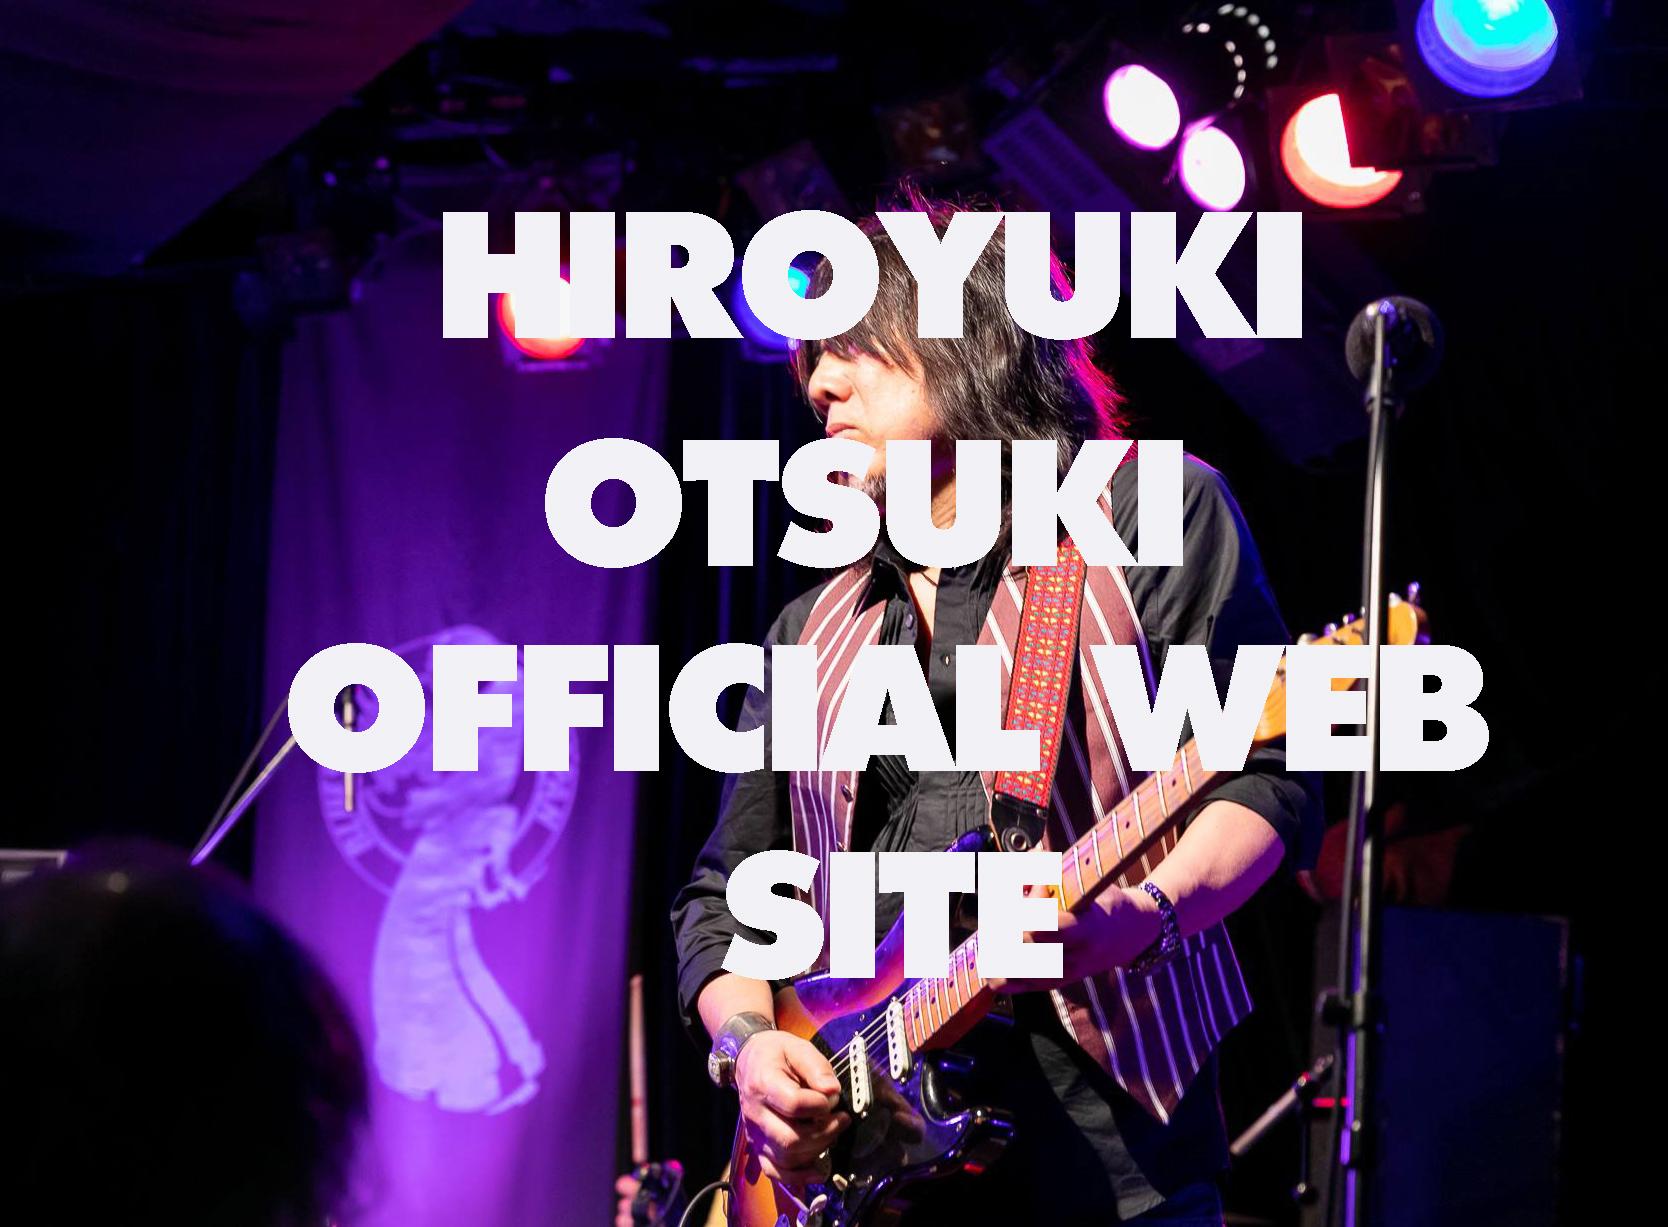 Hiroyuki Otsuki Official Web Site